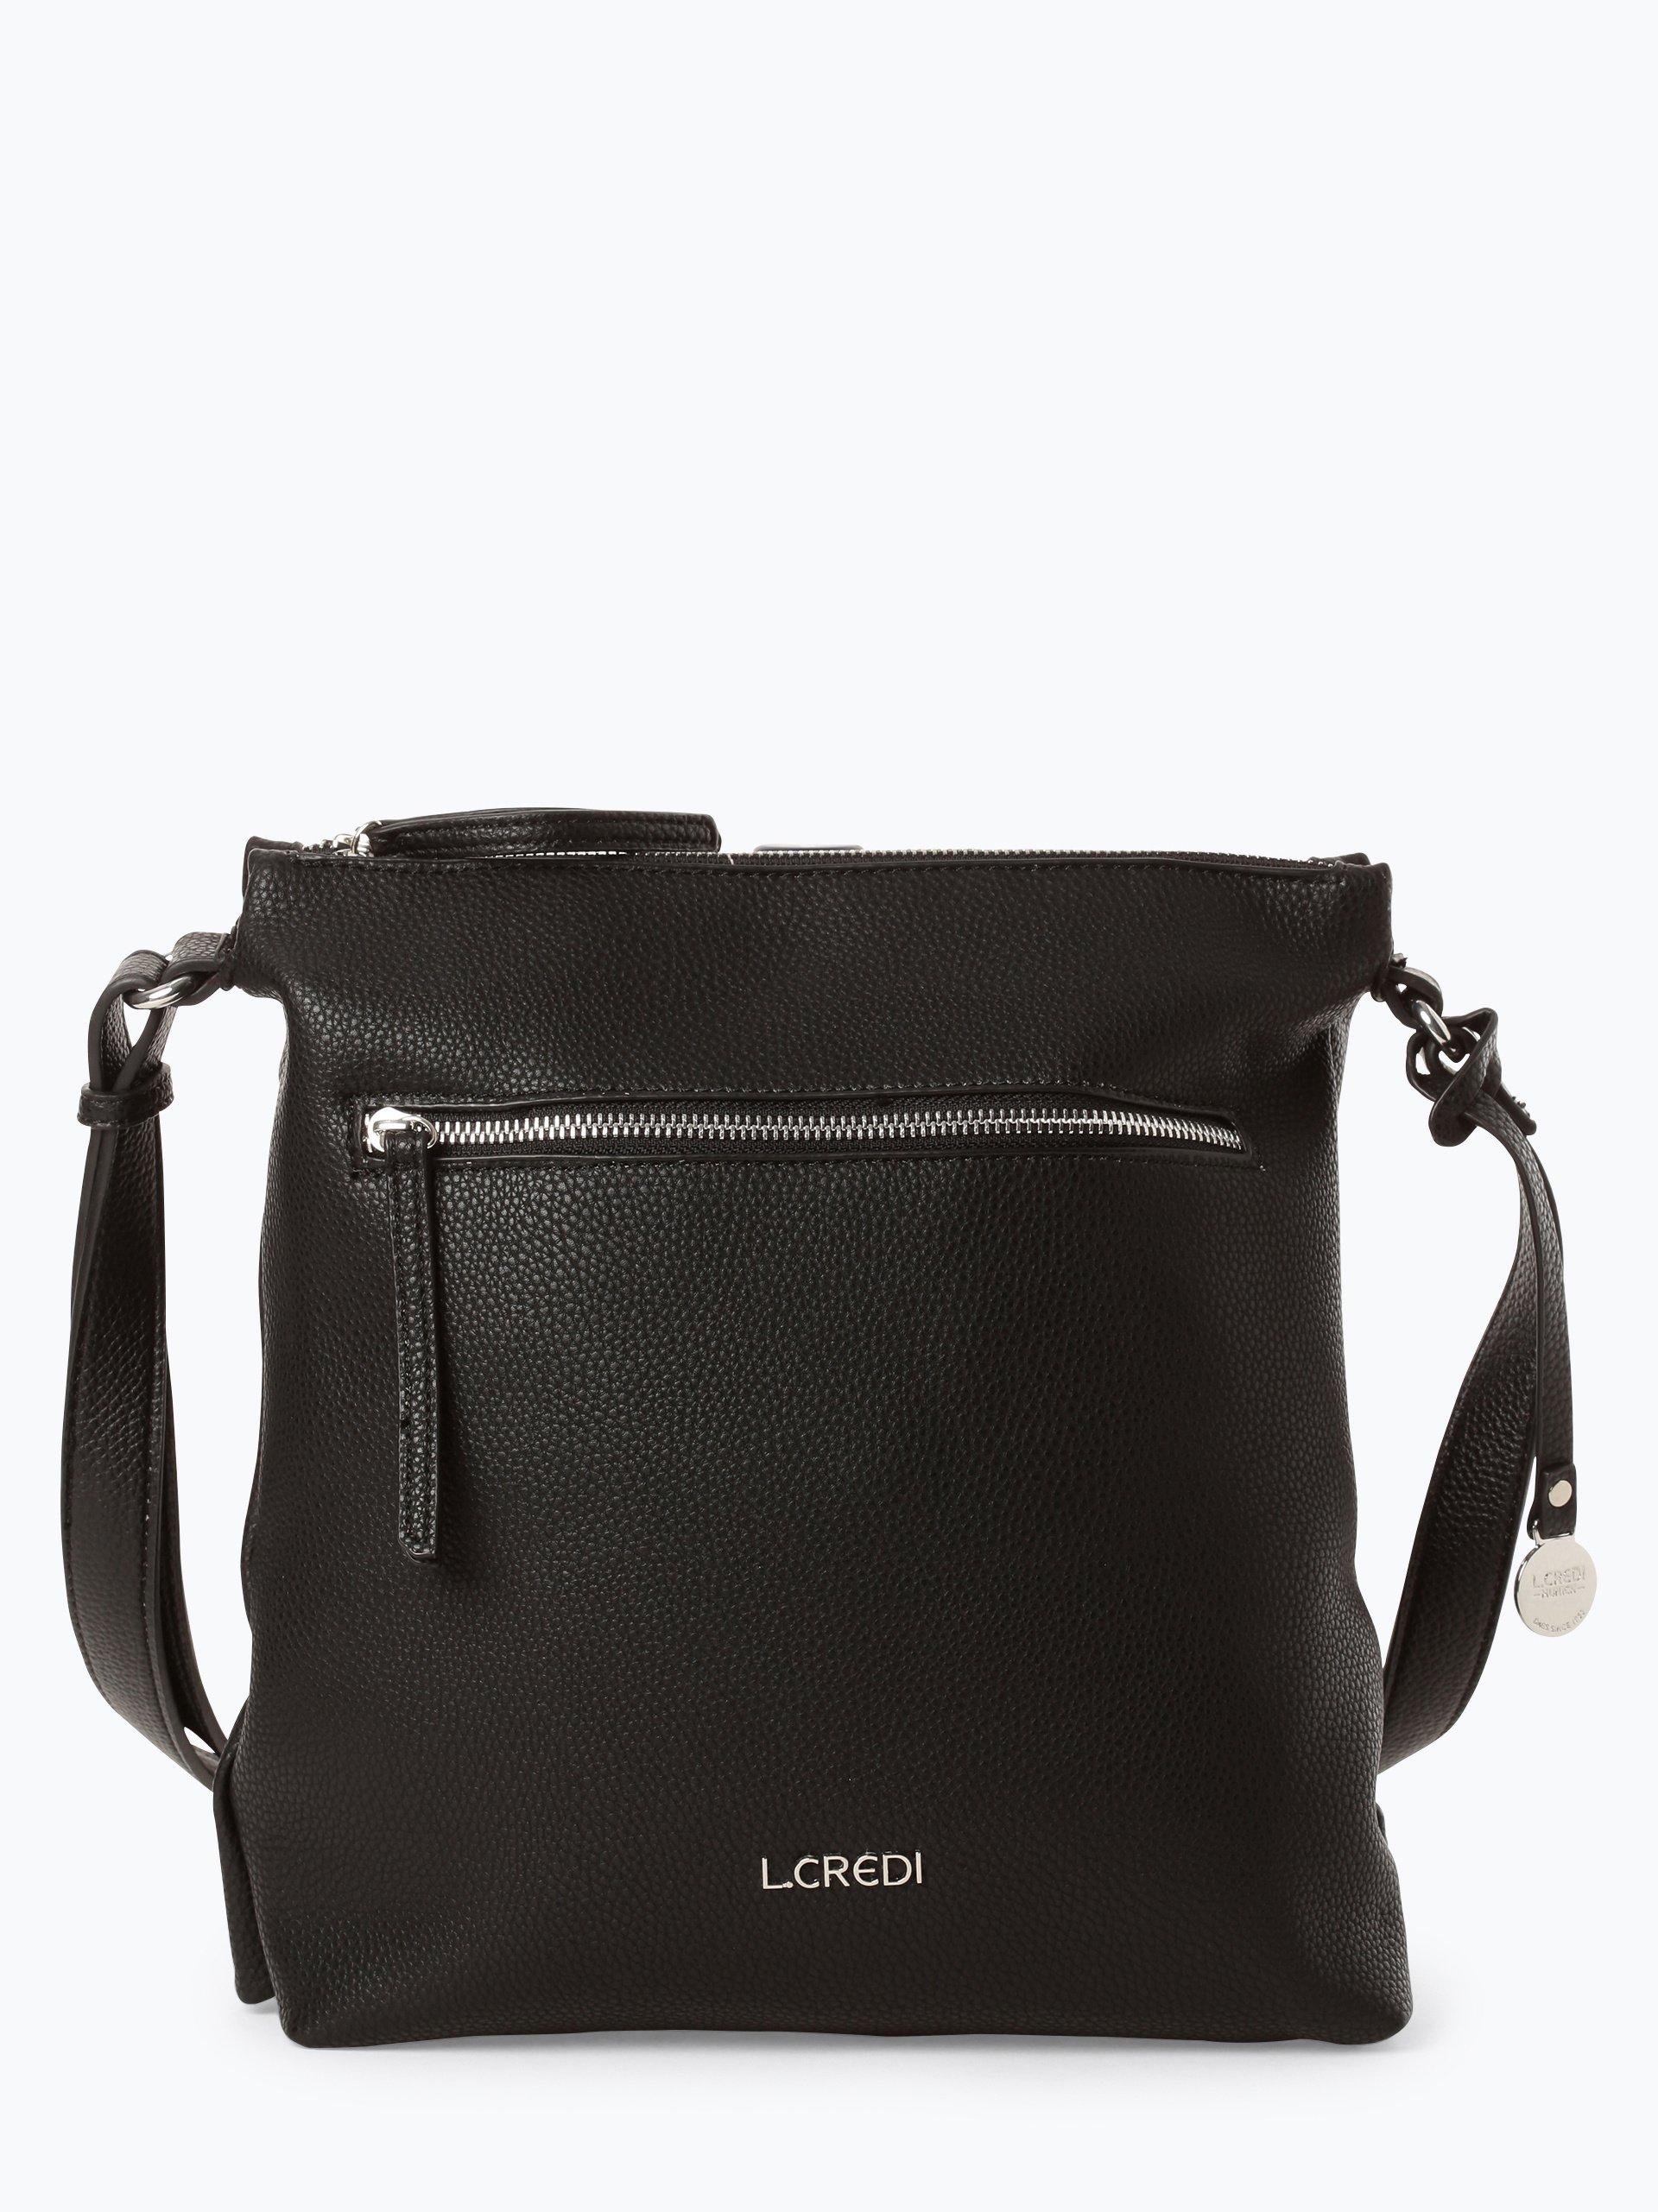 L.Credi Damen Handtasche